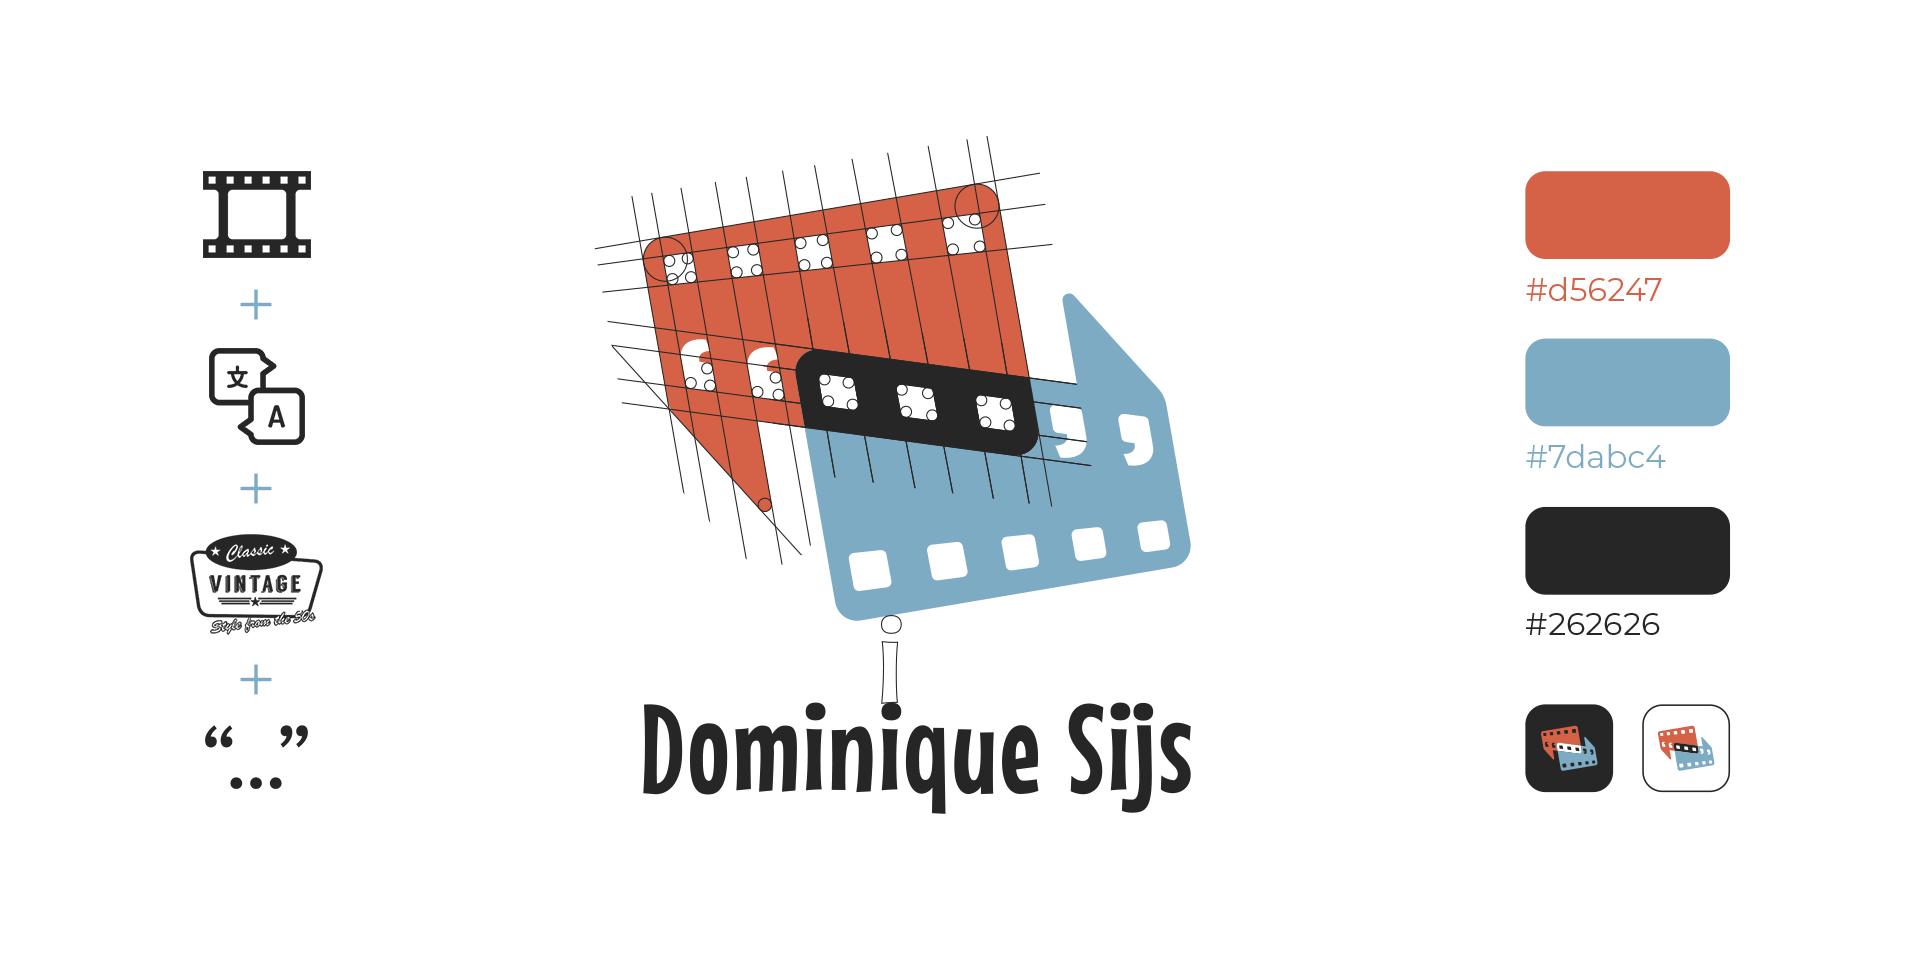 Dominique Sijs logo grid